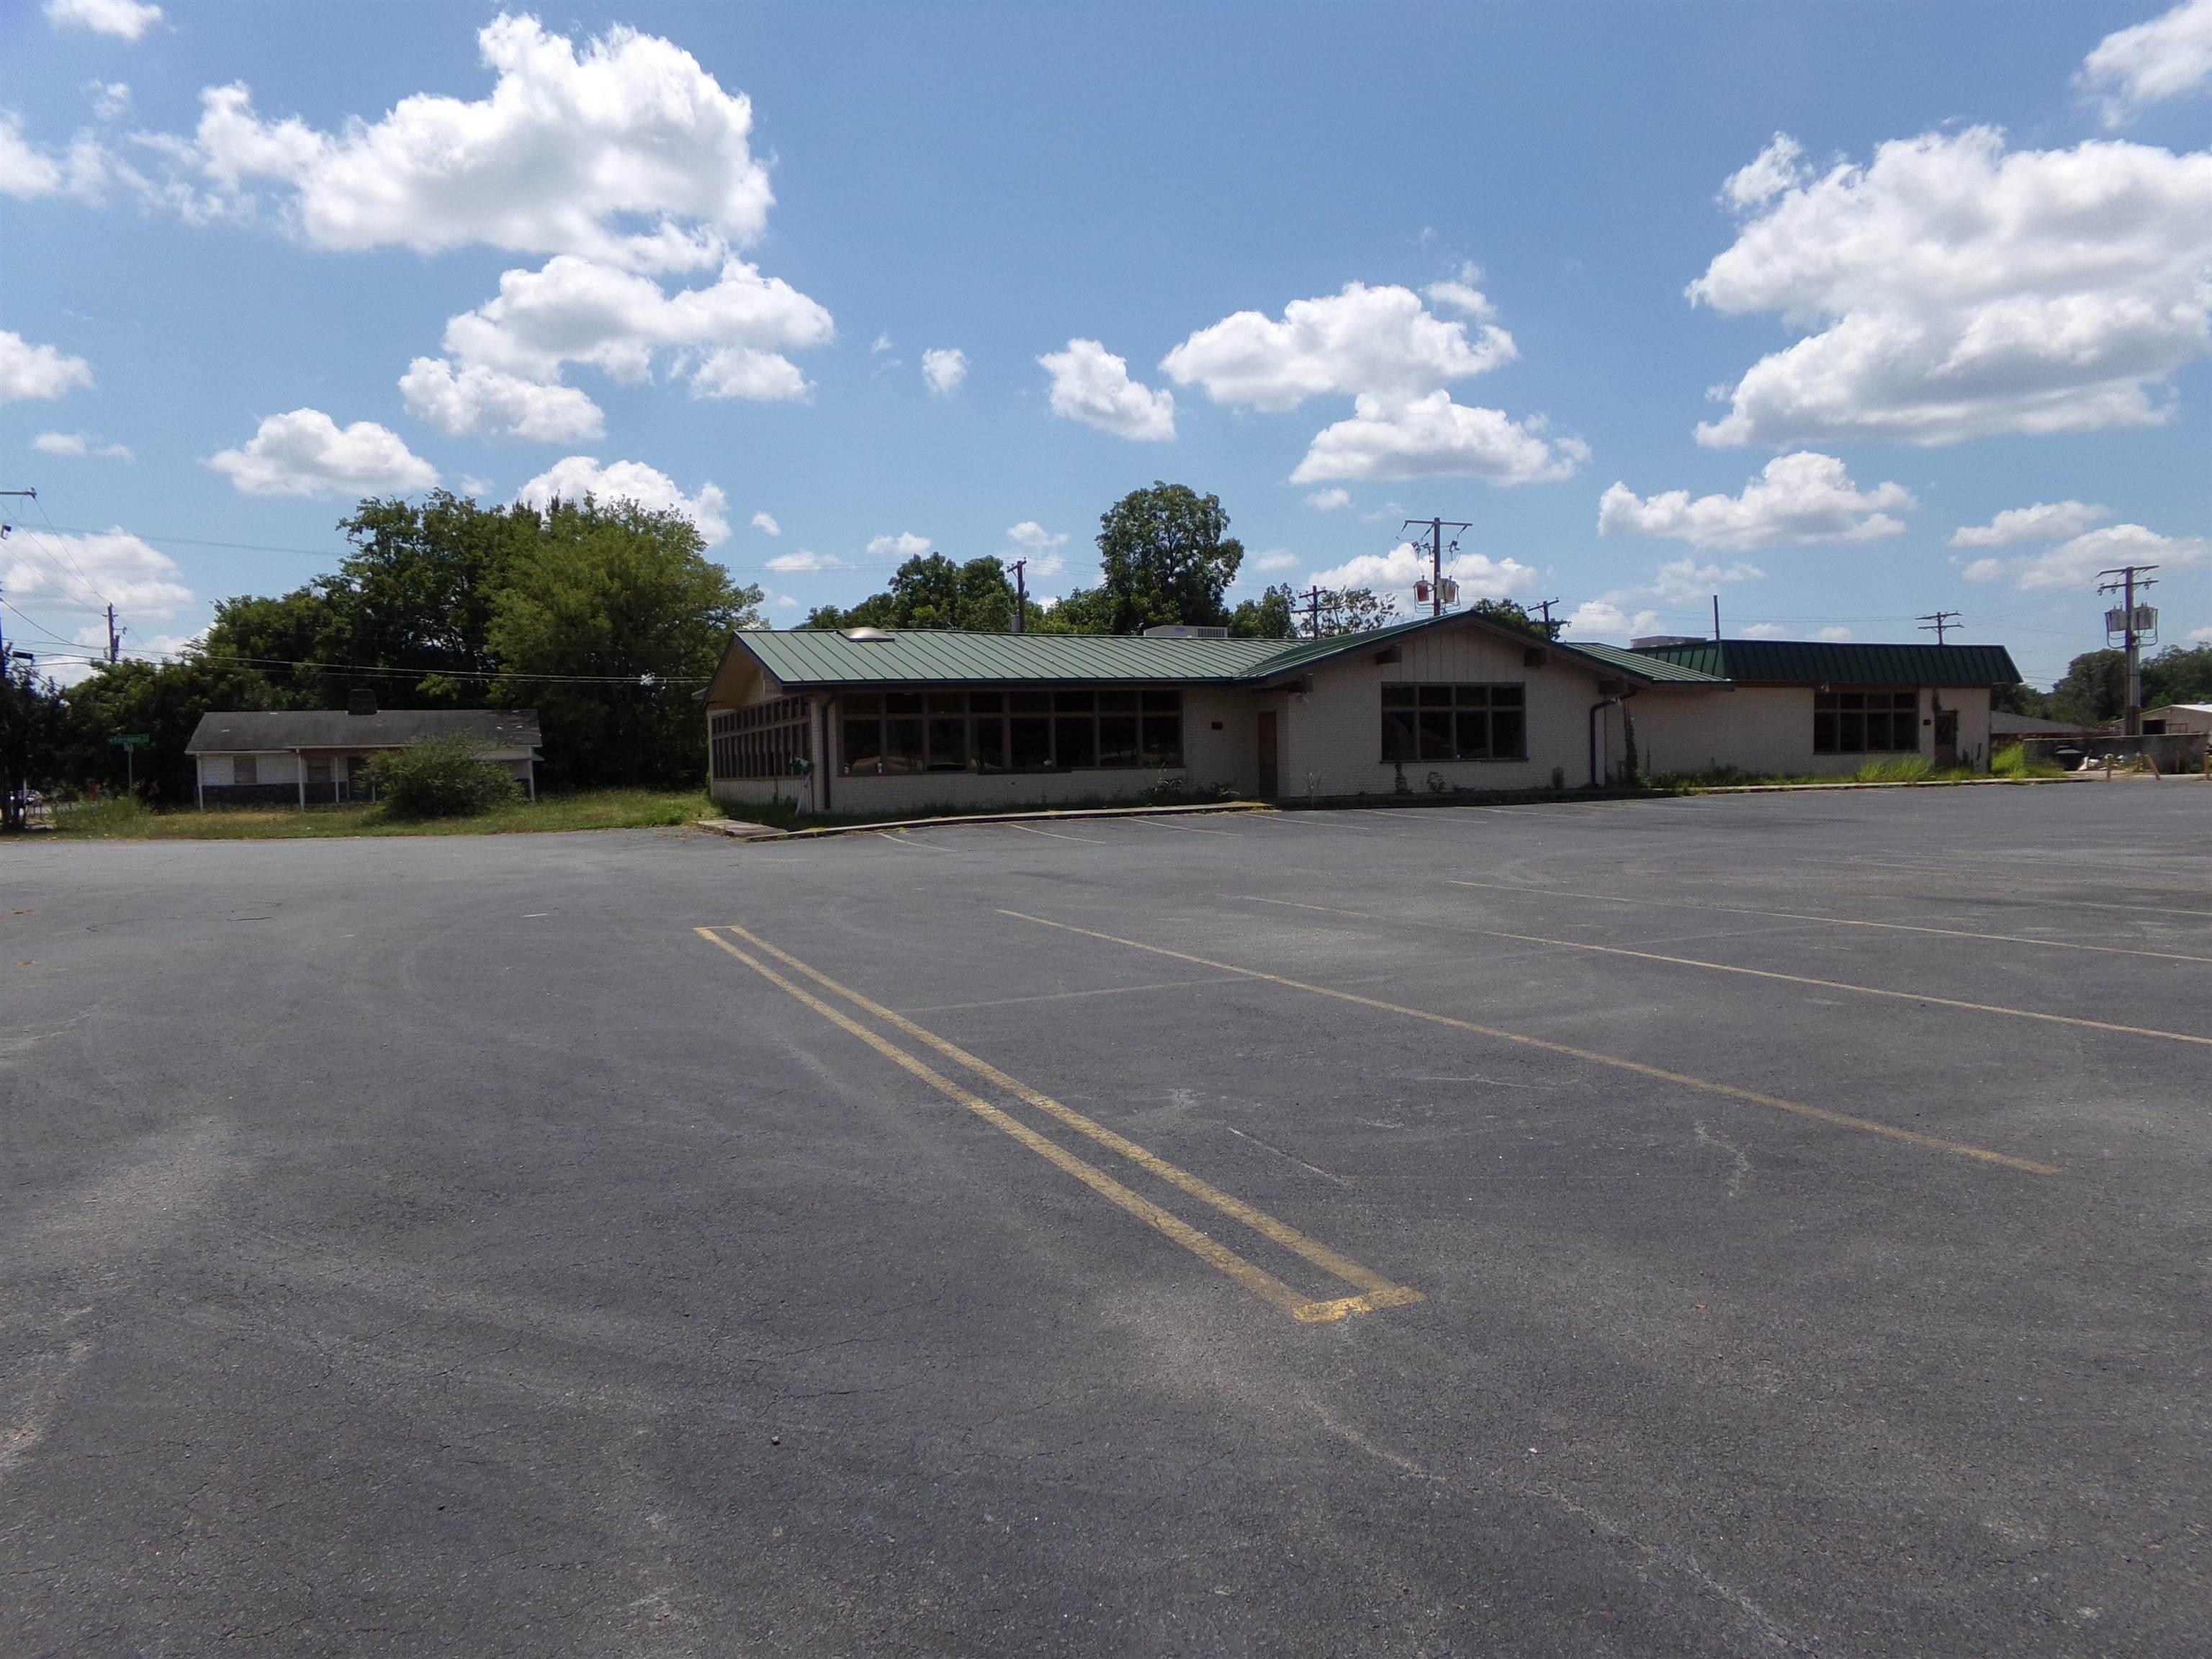 100 N Blake #No, Pine Bluff, AR 71601